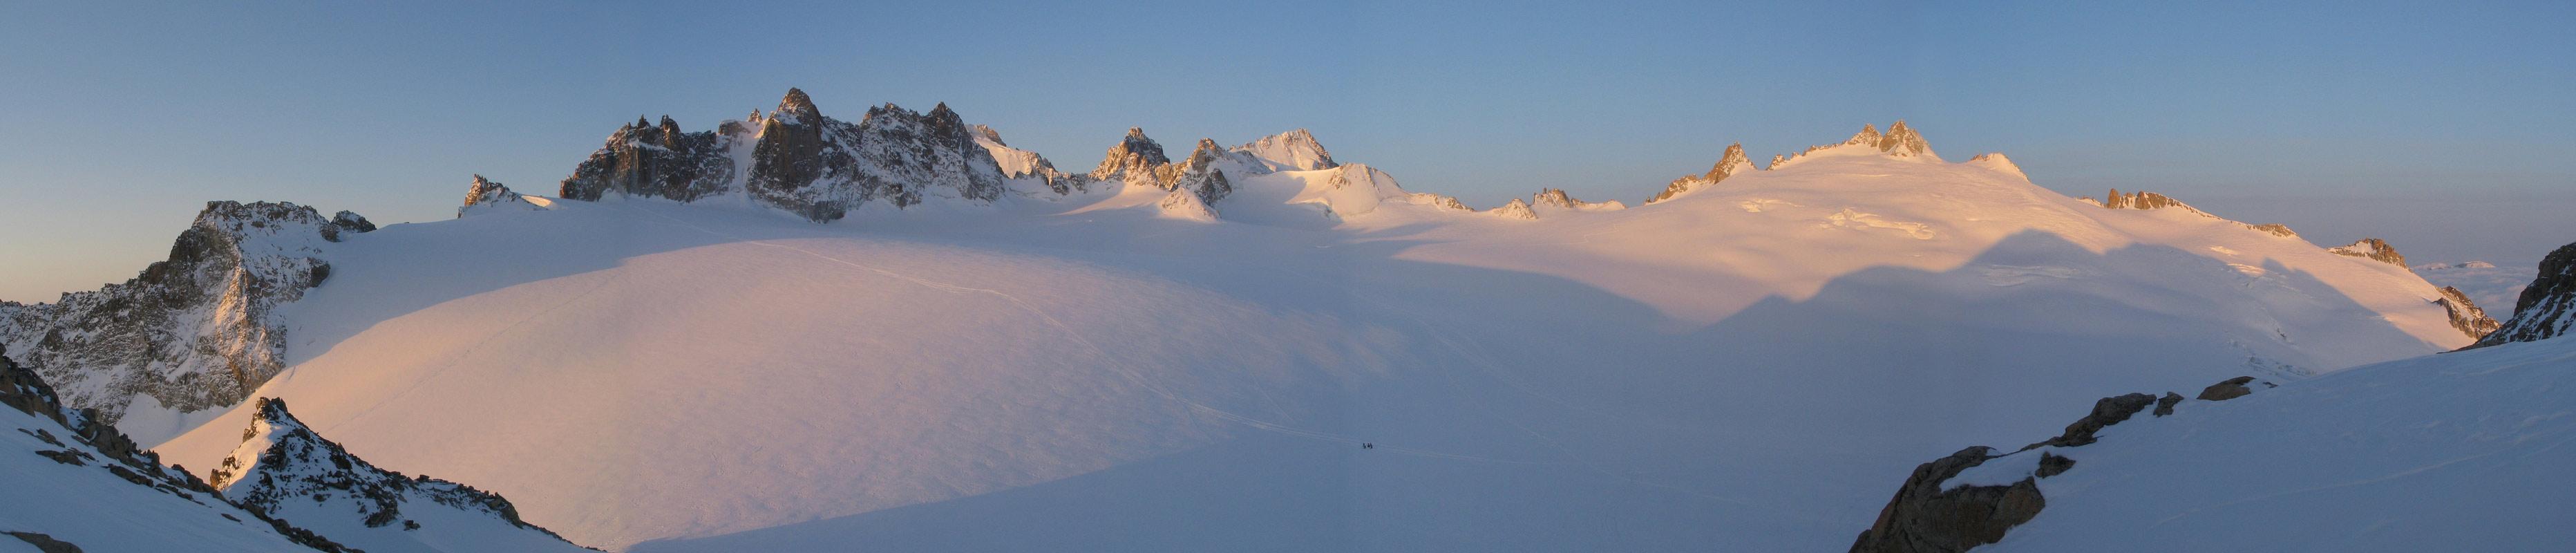 Val Arpette (Day2, H.R. Chamonix-Zermatt) Walliser Alpen / Alpes valaisannes Švýcarsko panorama 06